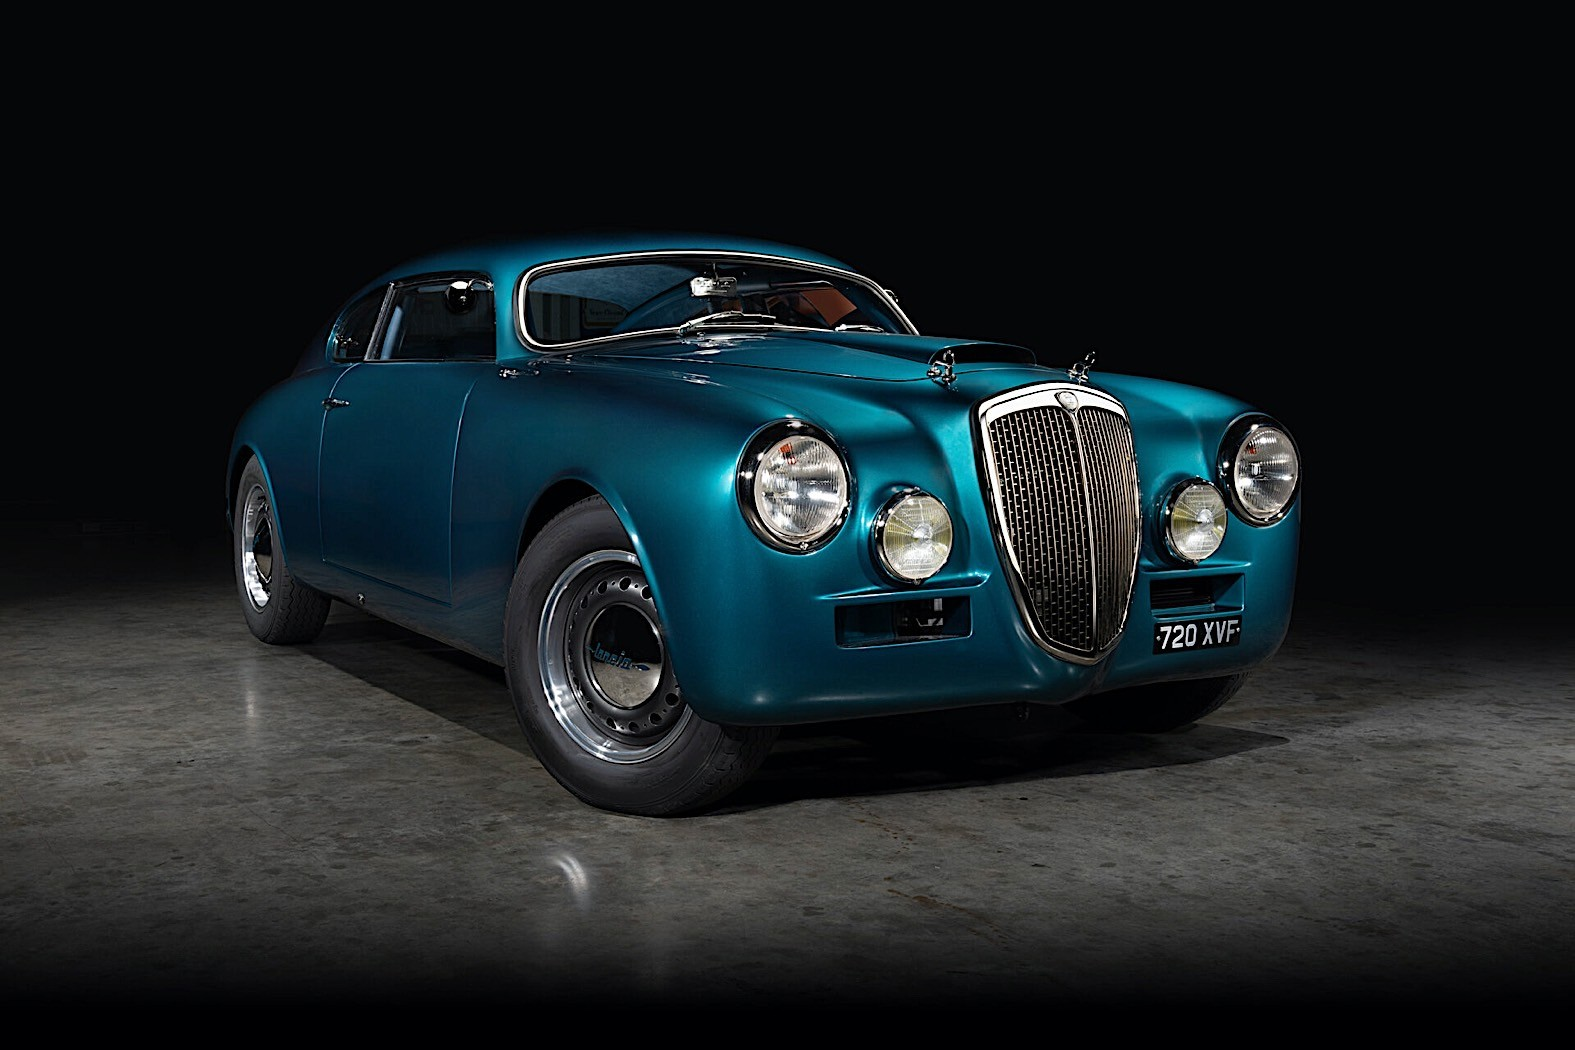 Restored-Lancia-Aurelia-B20GT-1